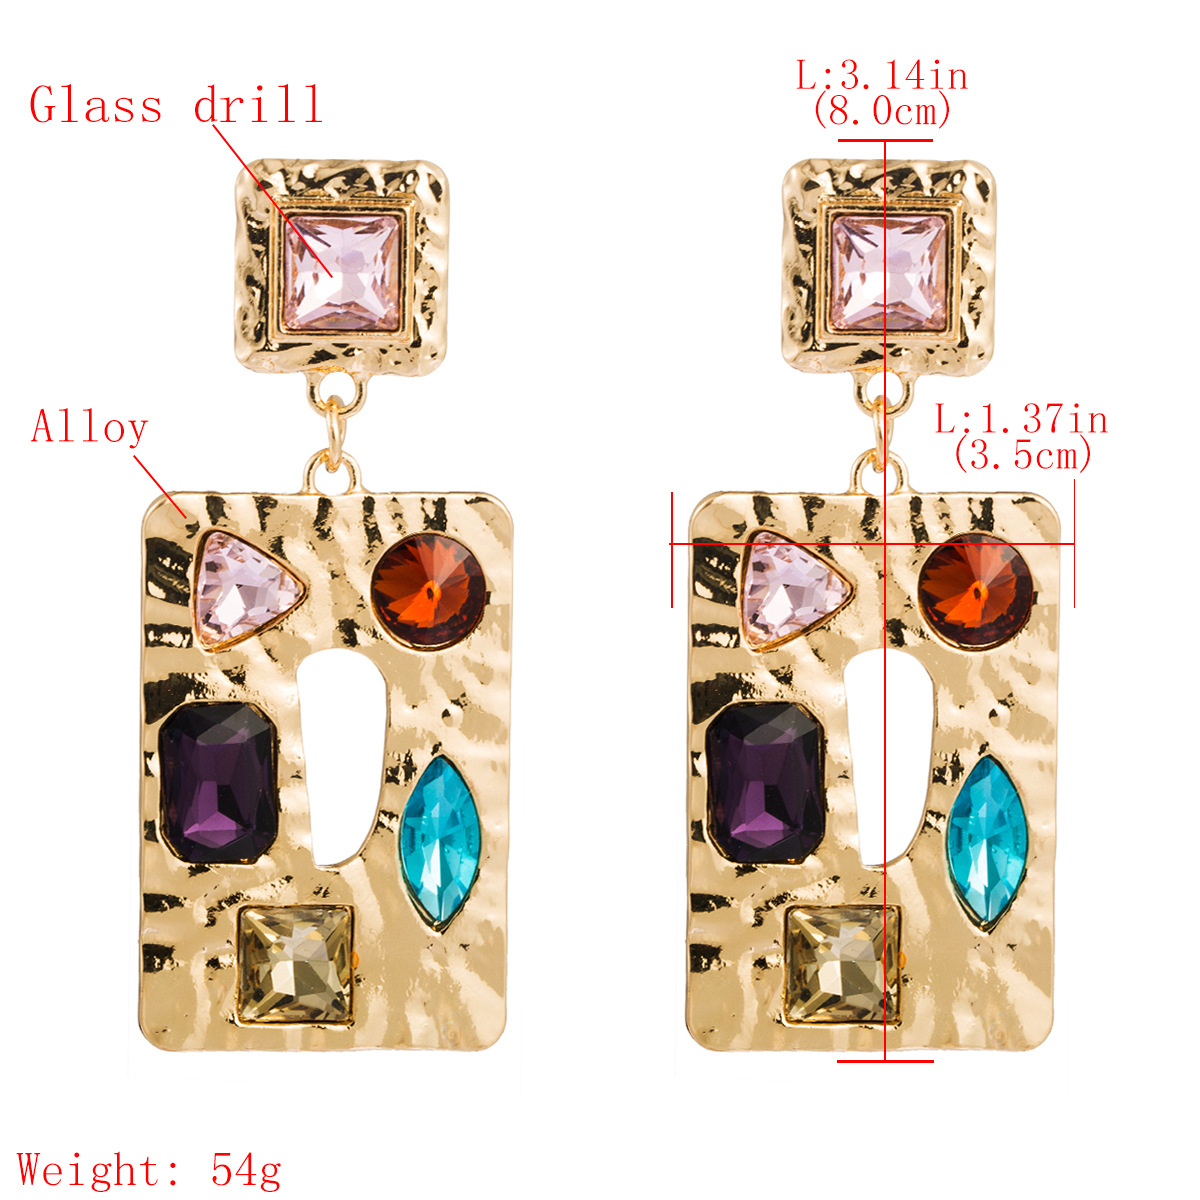 Square alloy diamond glass drill earrings female fashion metal texture bohemian earrings NHJE176151